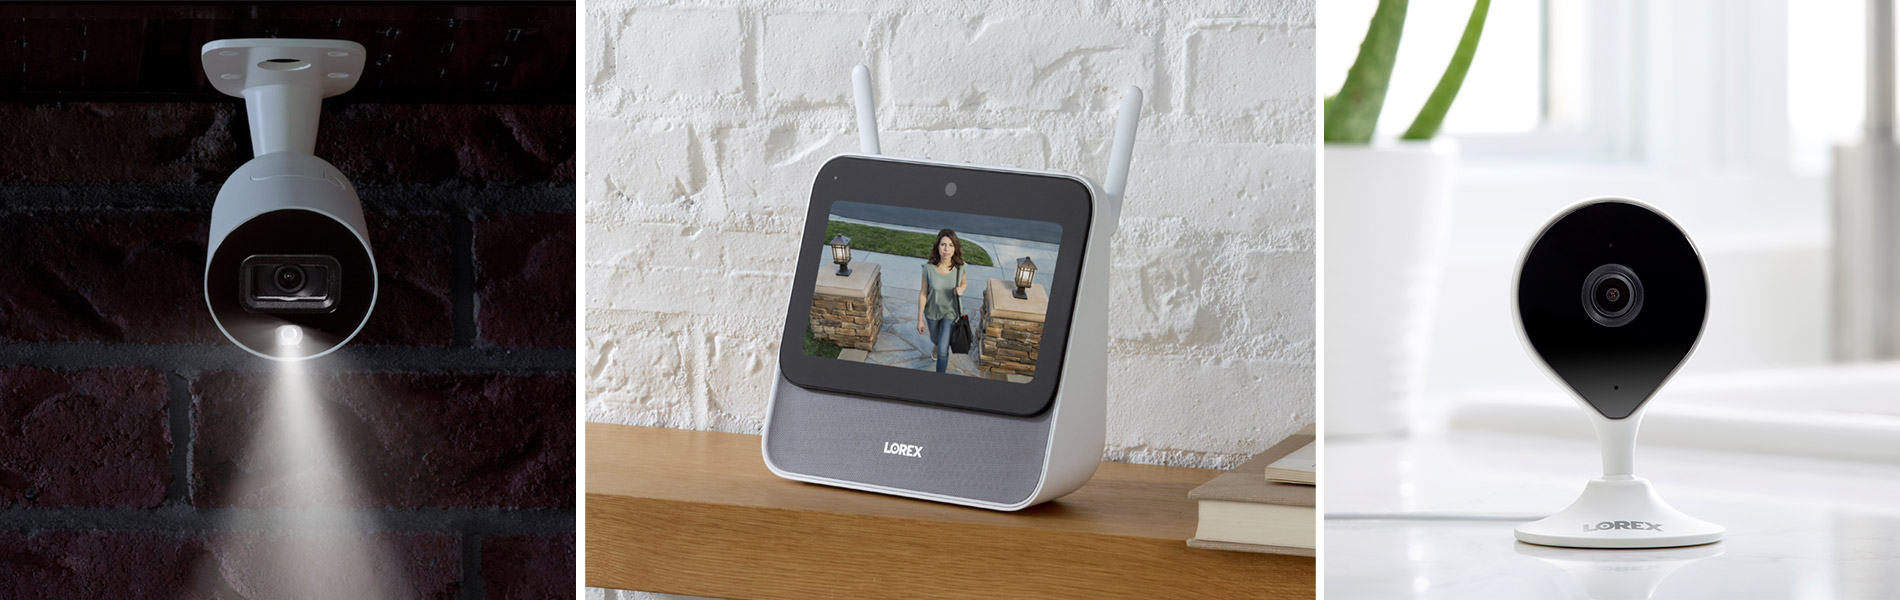 LSHSC and Indoor / Outdoor Cameras